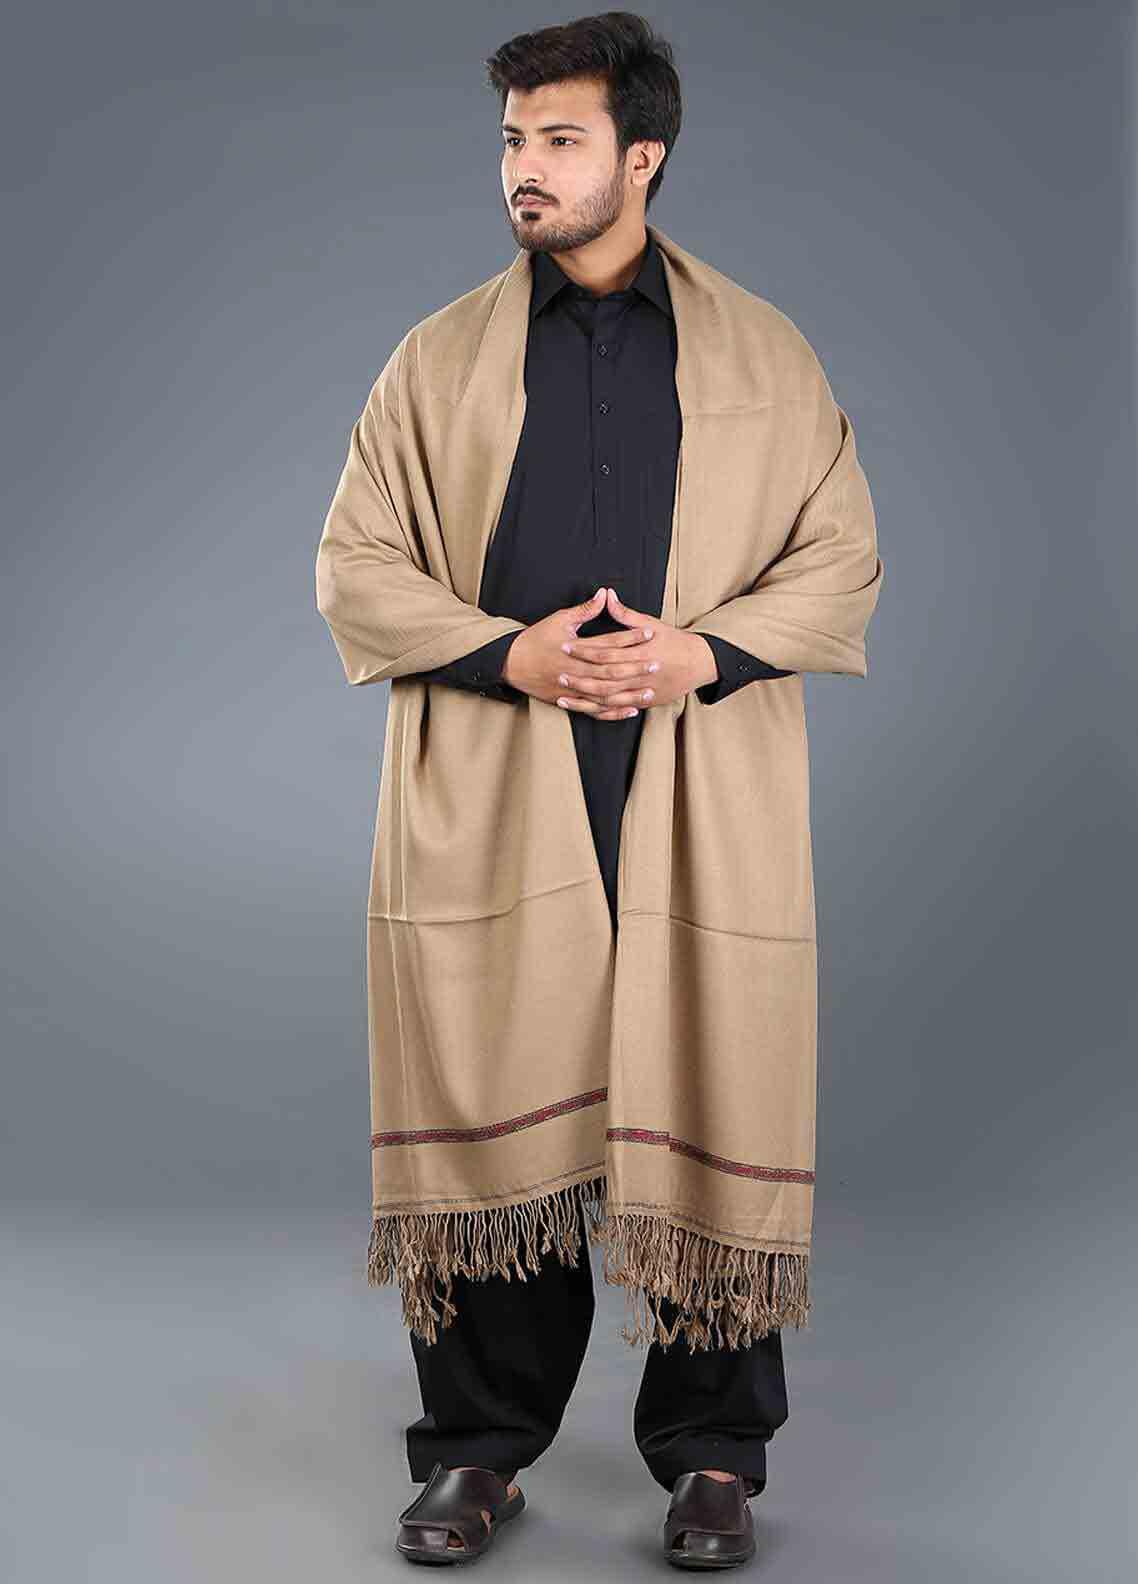 Original pashmina shawls